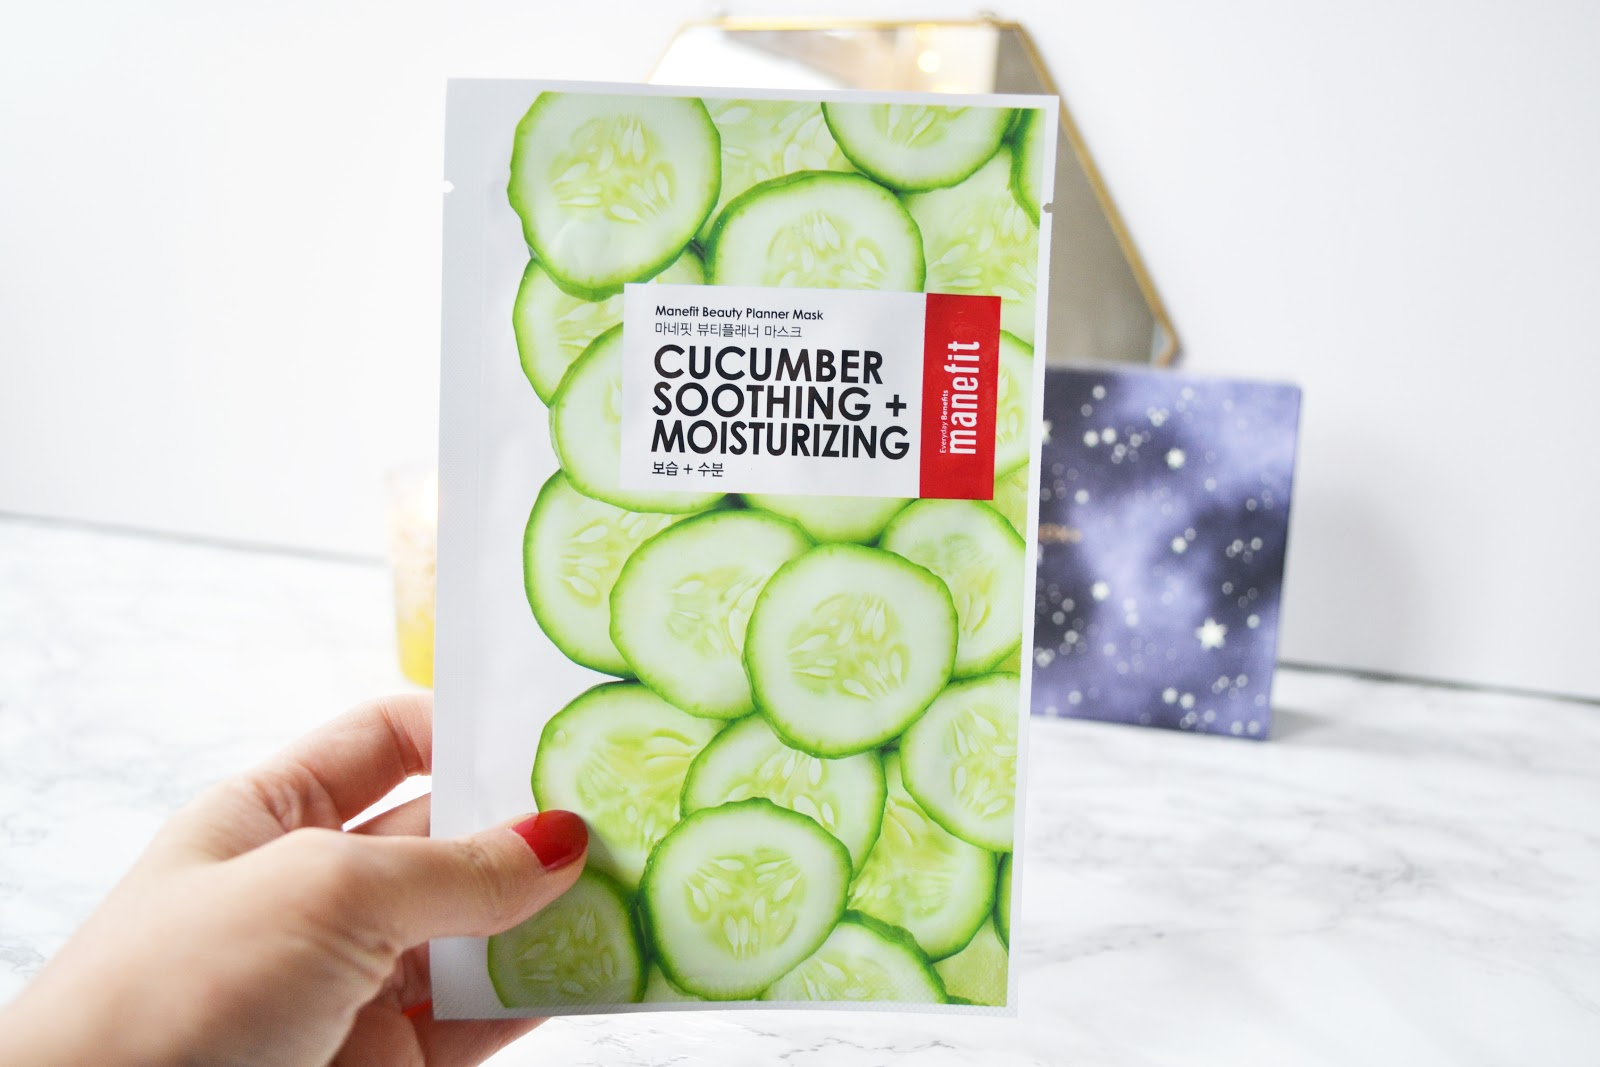 Manefit Cucumber Soothing + Moisturizing Sheet Mask